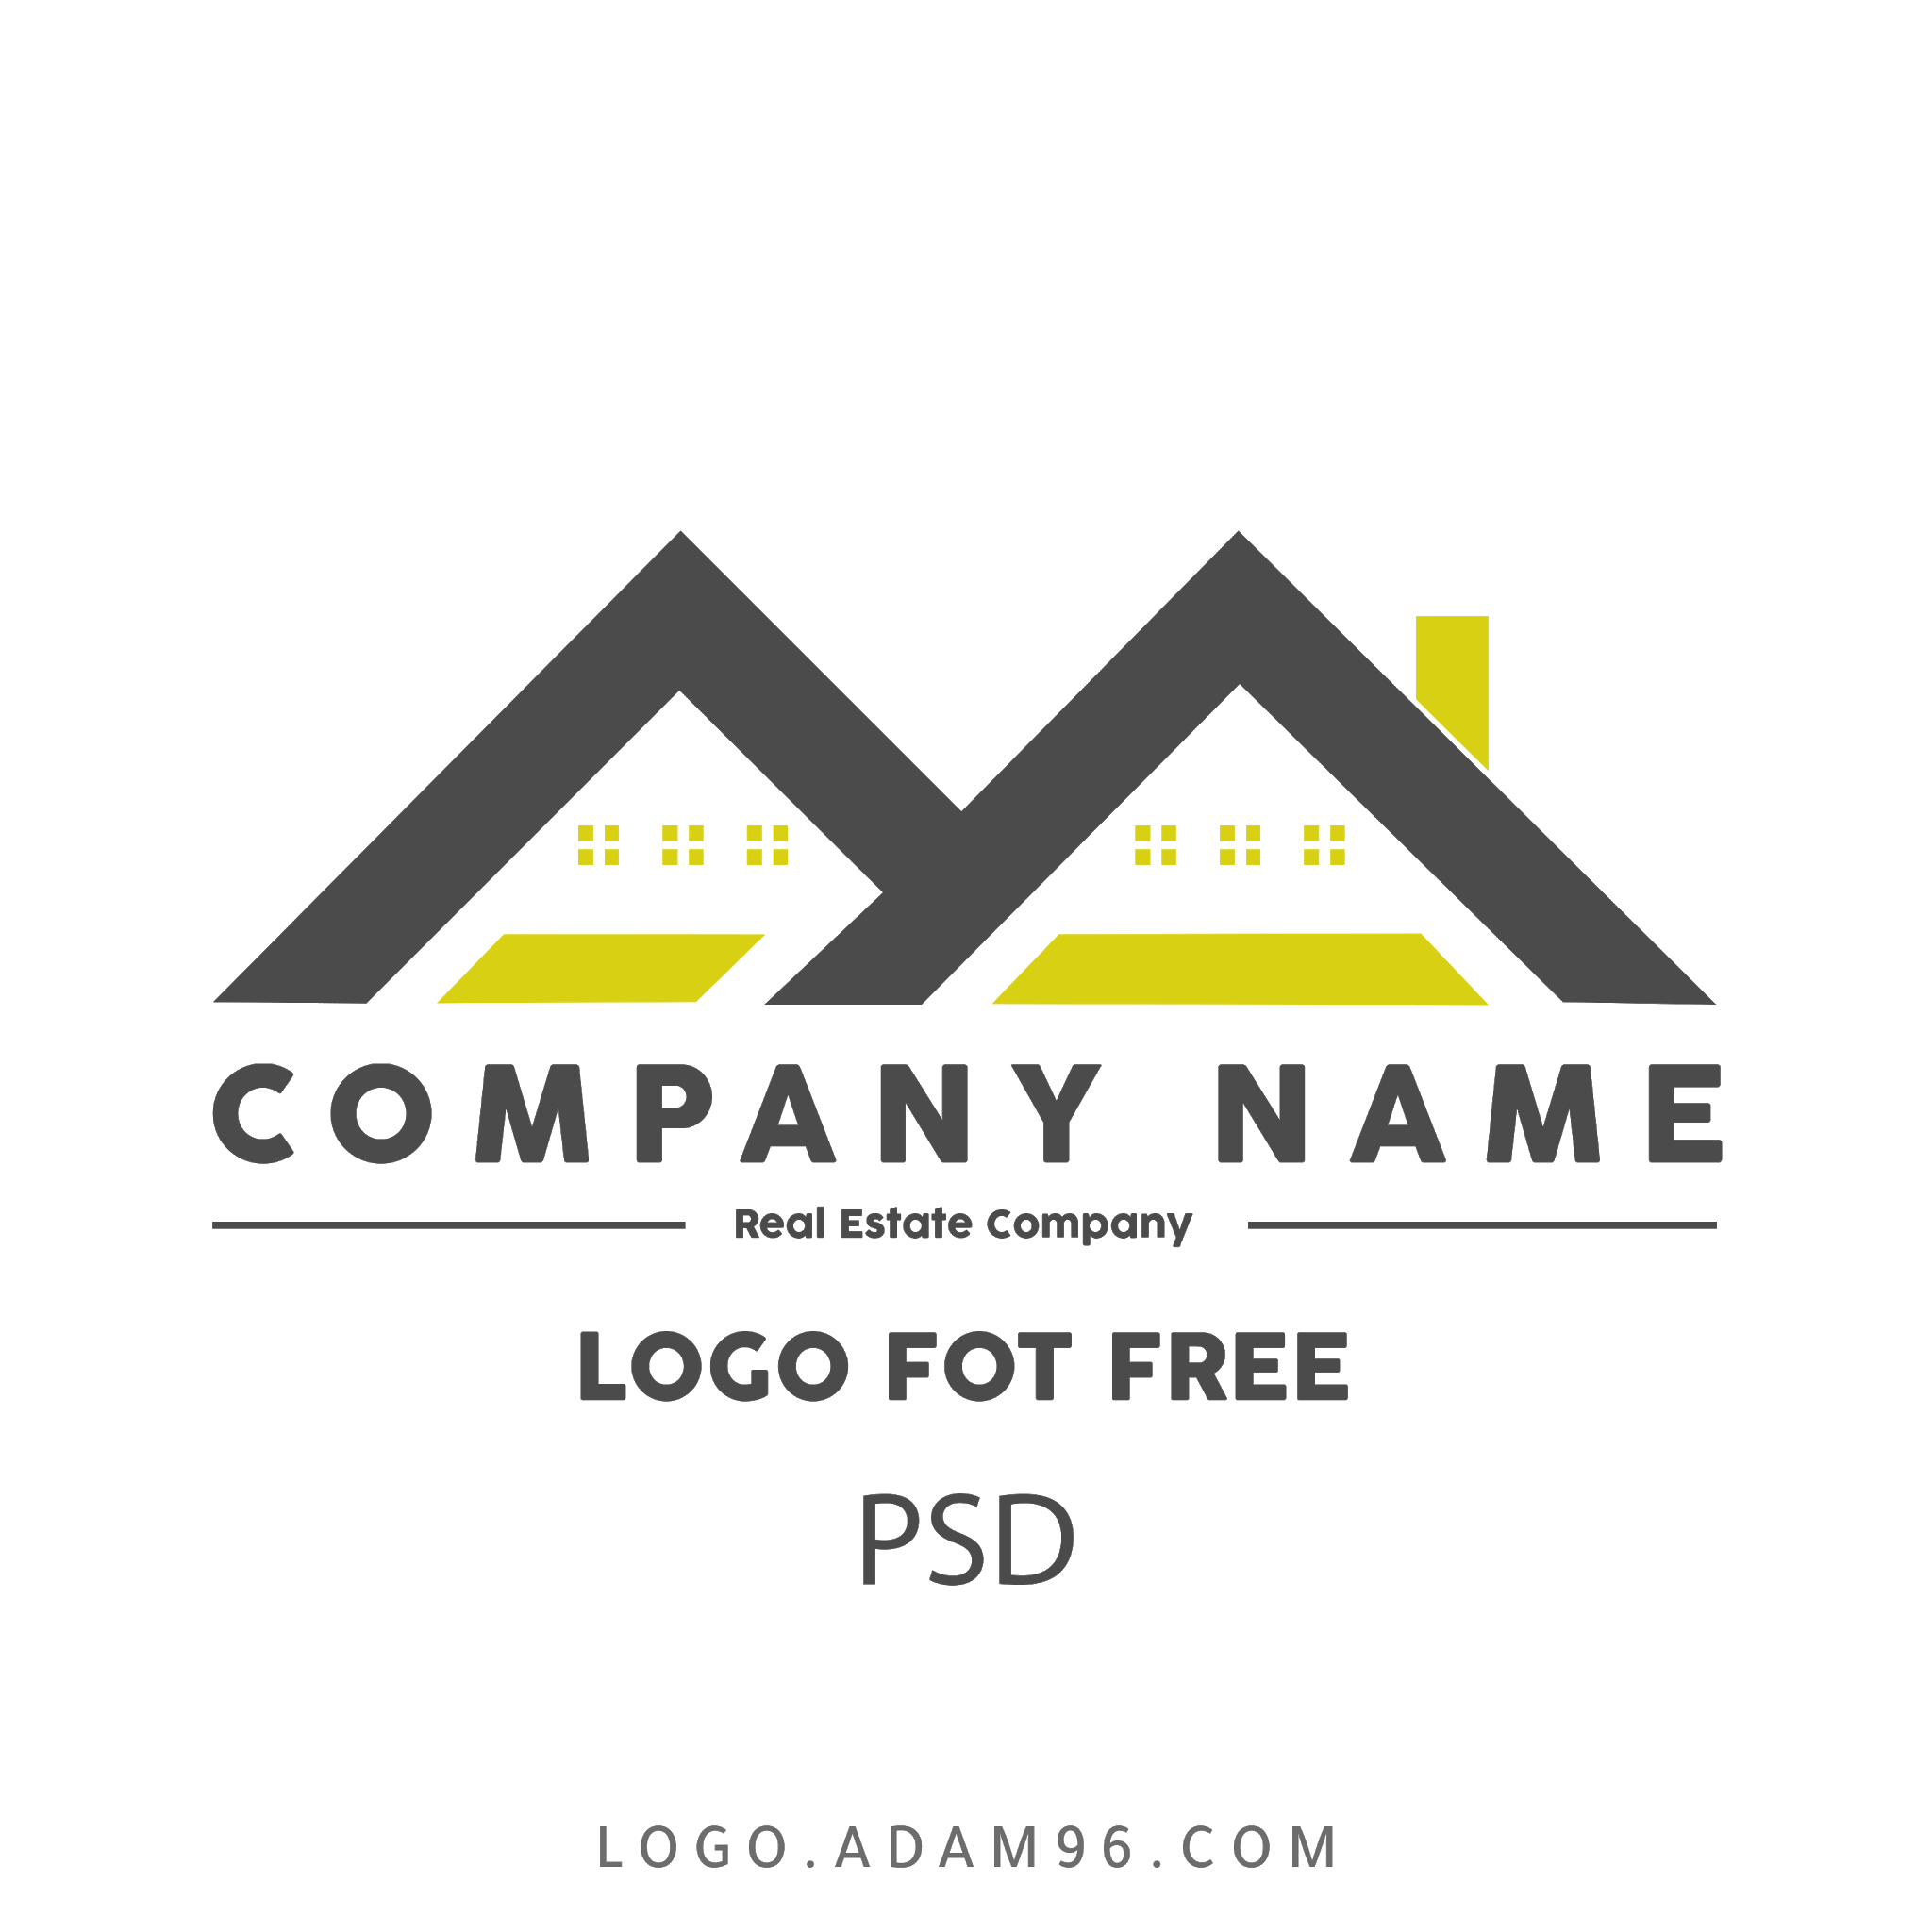 تحميل شعار شركة عقار مجاناً بدون حقوق لوجو حصري بصيغة PSD مفتوح للتعديل